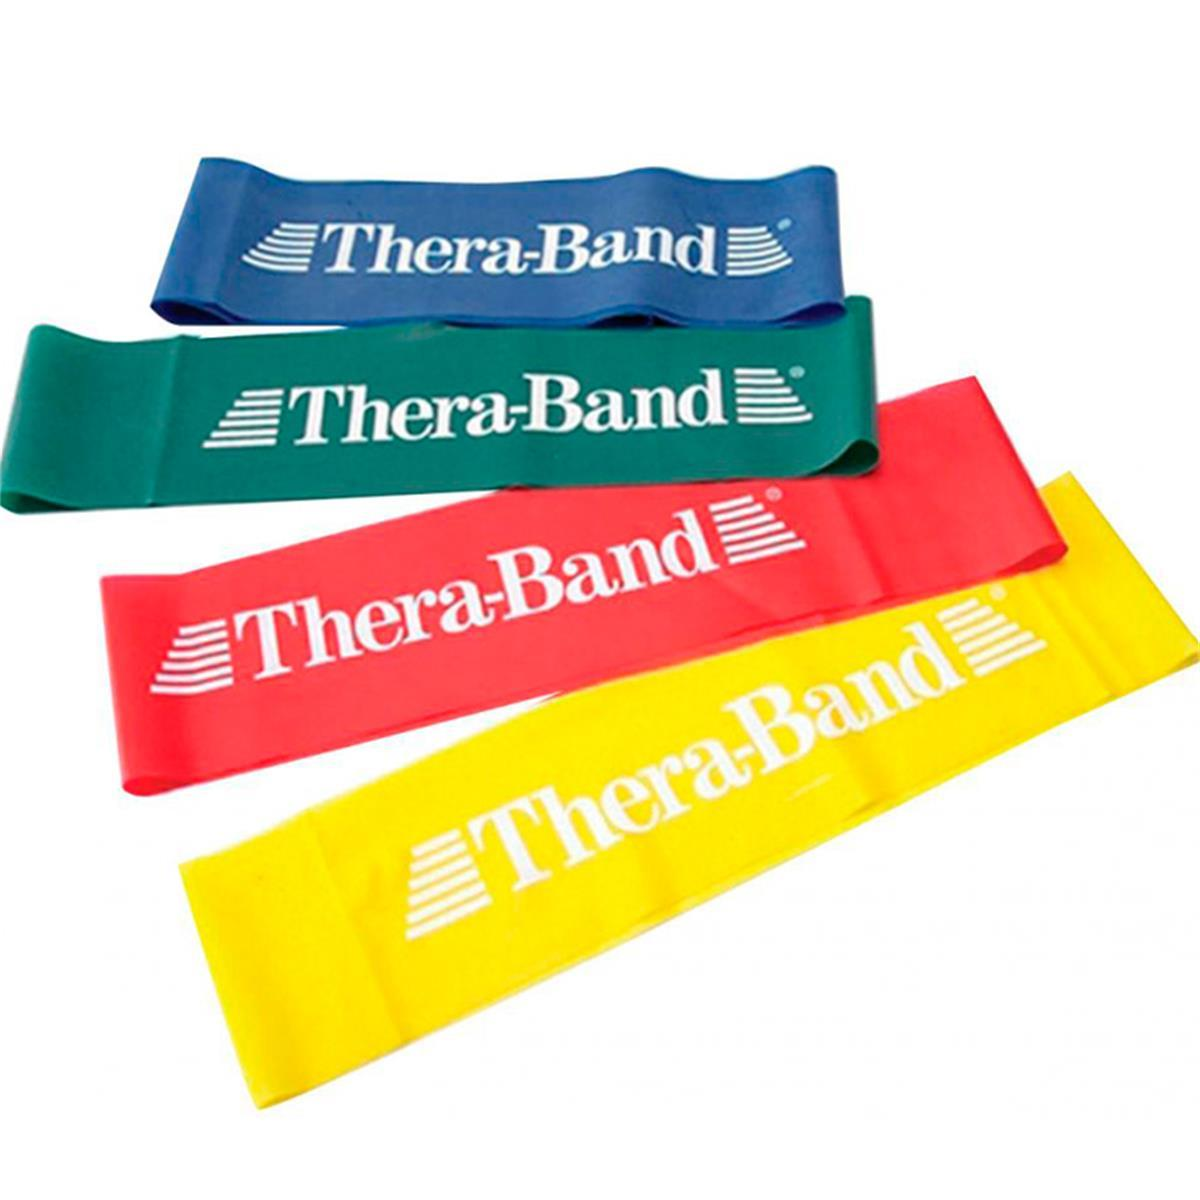 Faixa Elástica Circular Band Loops 45 Cm - Thera Band